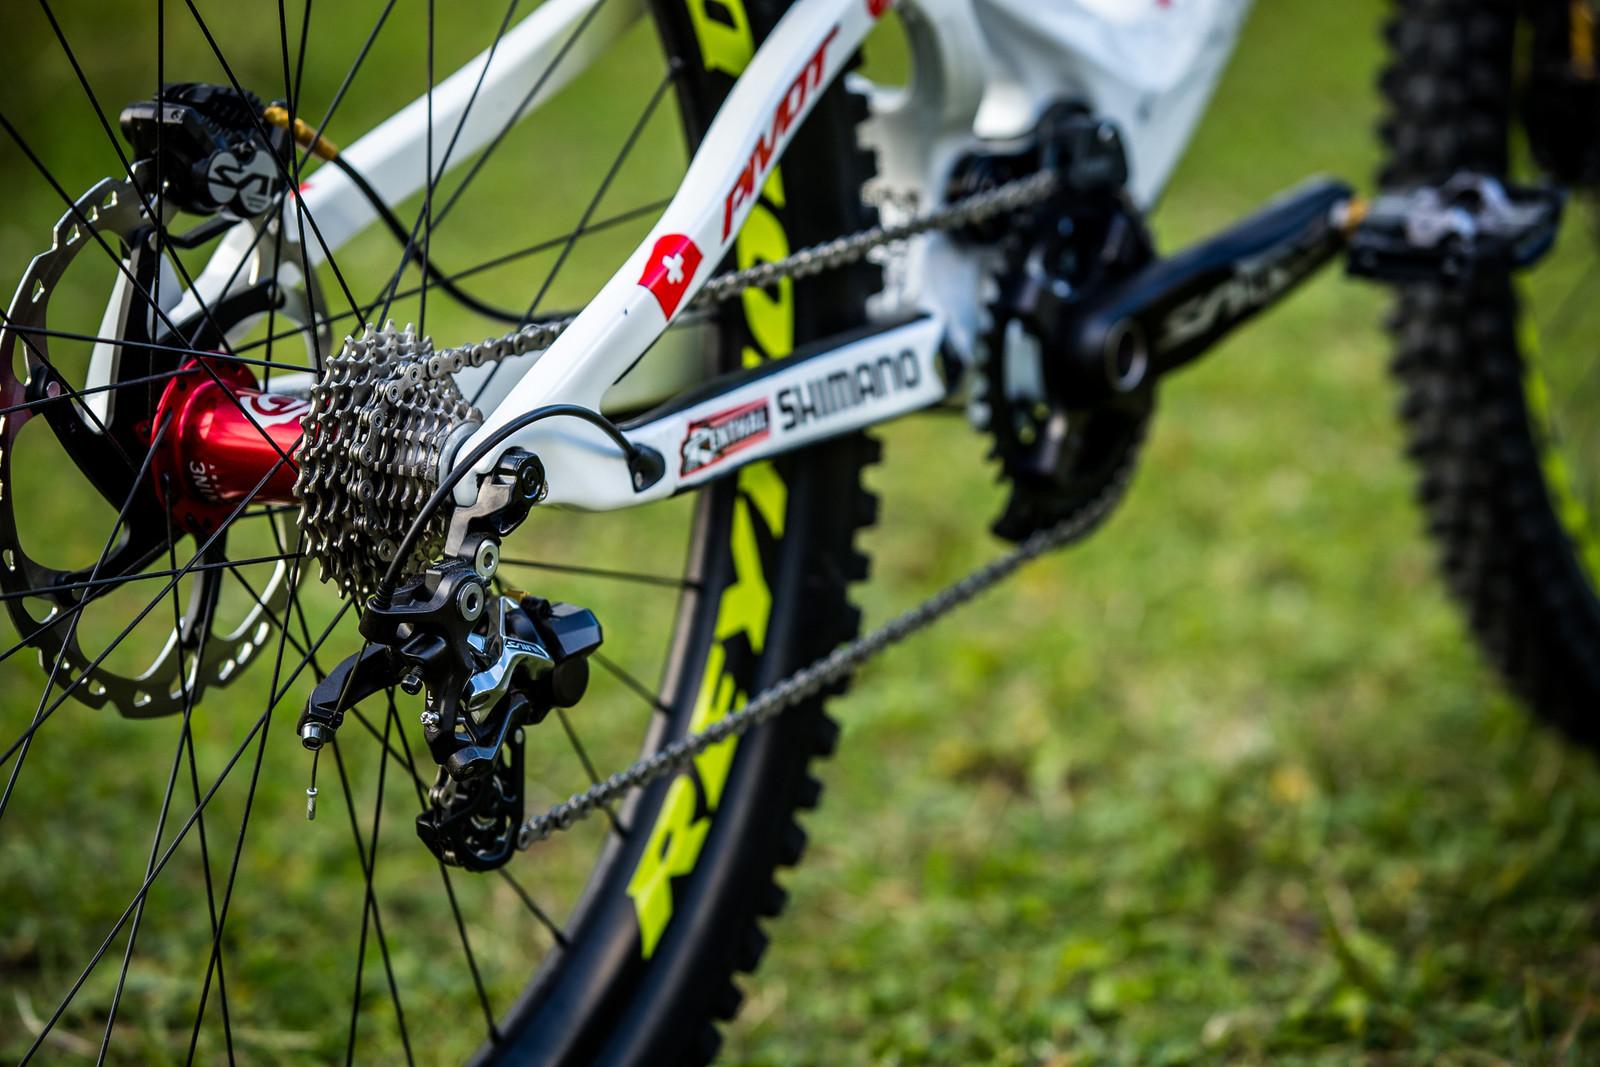 Rear End - WORLD CHAMPS BIKE - Emilie Siegenthaler's Pivot Phoenix - Mountain Biking Pictures - Vital MTB